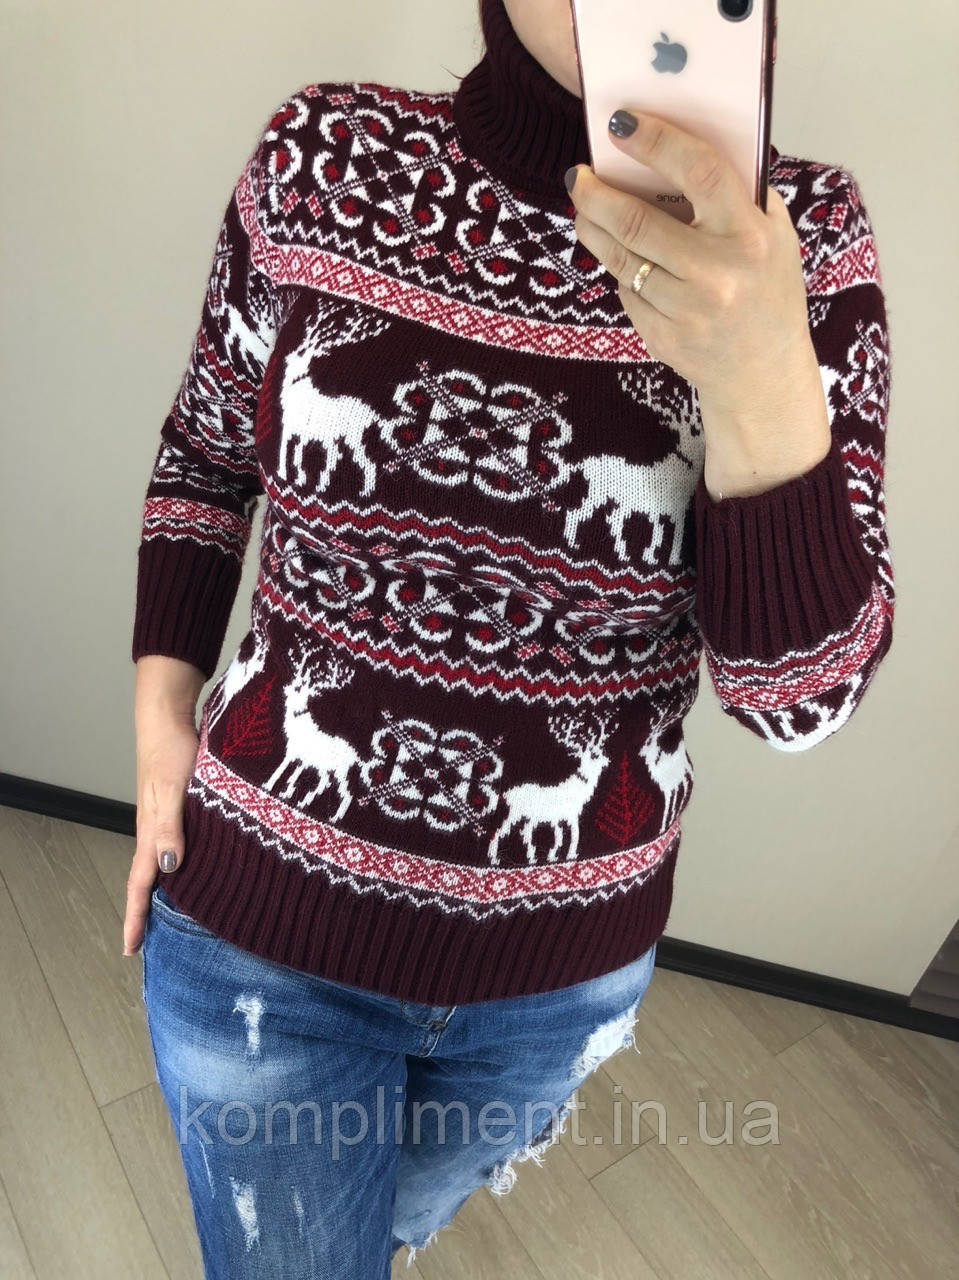 Шерстяной зимний турецкий свитер с рисунком, бордо